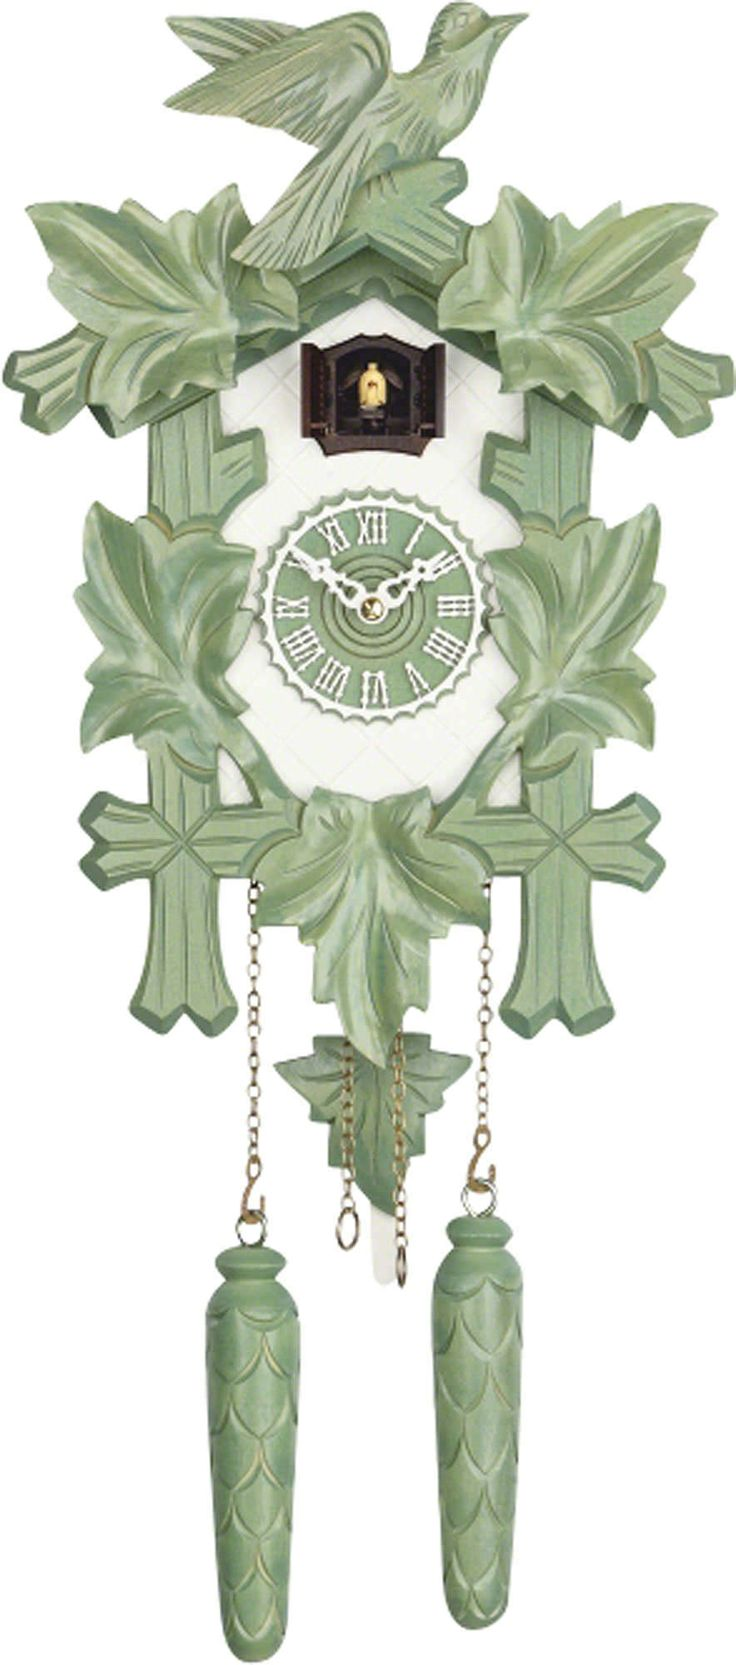 Modern Art Cuckoo Clocks Modern Tradition Cuckoo Clock Quartz-movement Modern-Art-Style 35cm by Trenkle Uhren